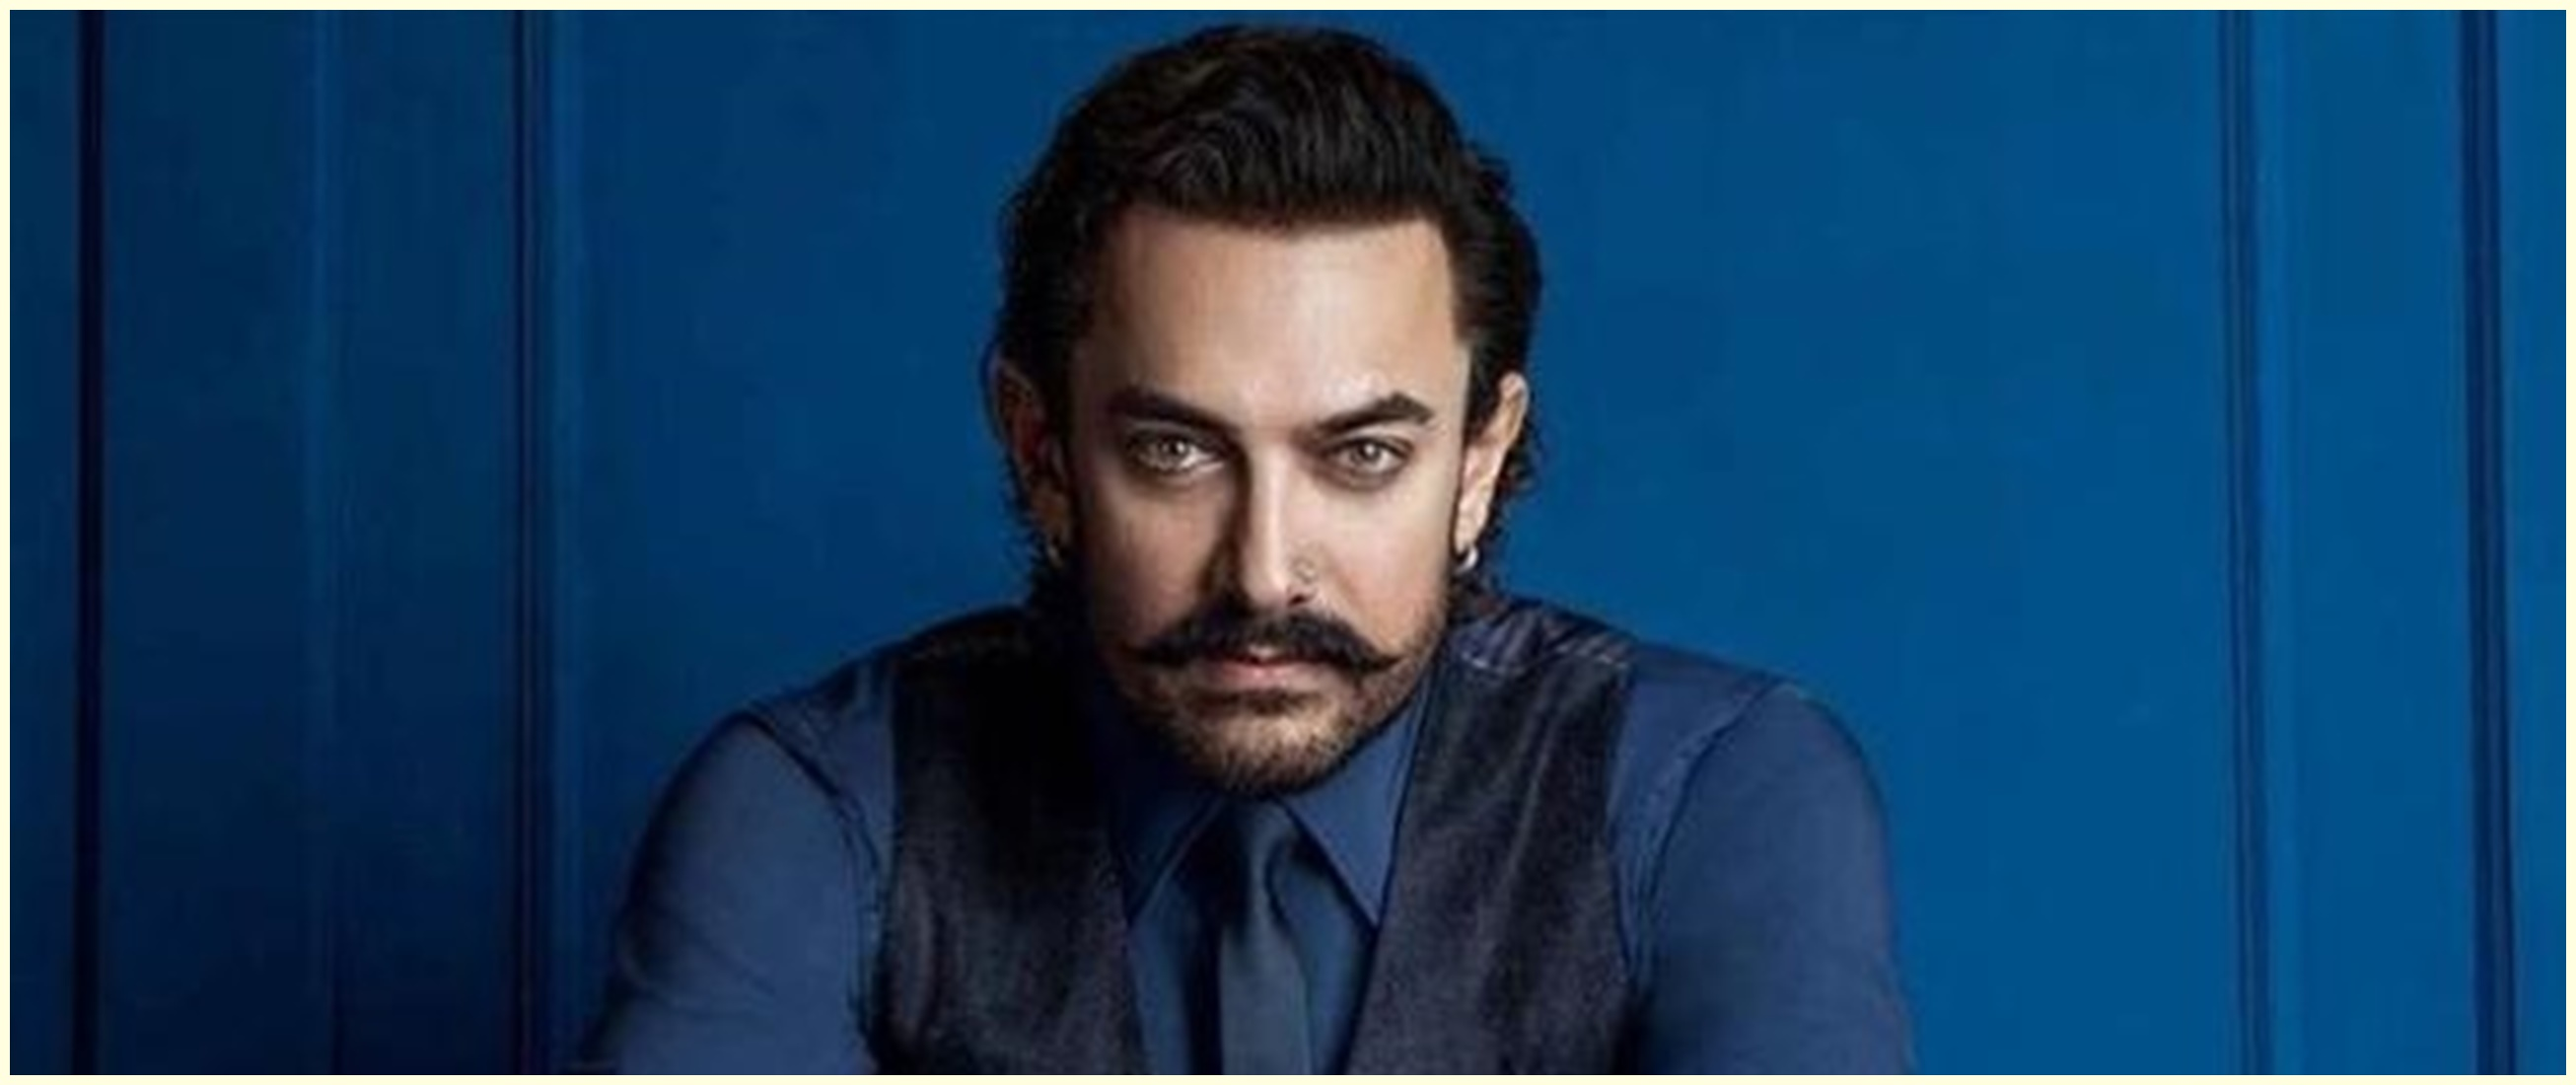 8 Transformasi aktor Bollywood Aamir Khan, awet muda di usia 55 tahun